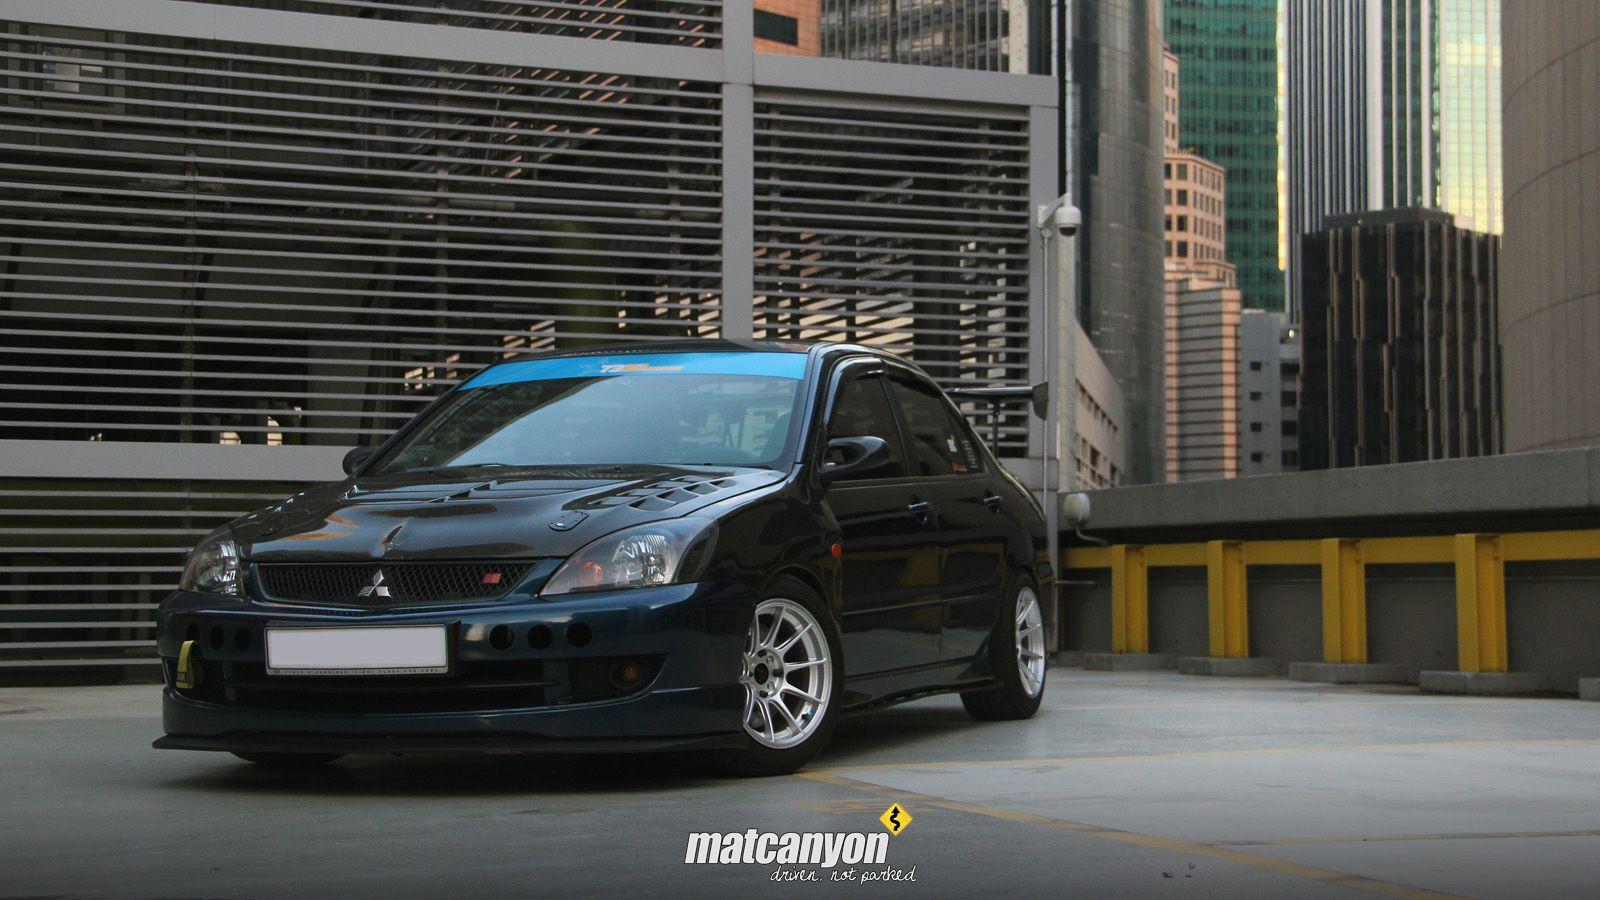 Img 5449 Jpg 1600 900 Mitsubishi Evo Mitsubishi Lancer Dream Cars